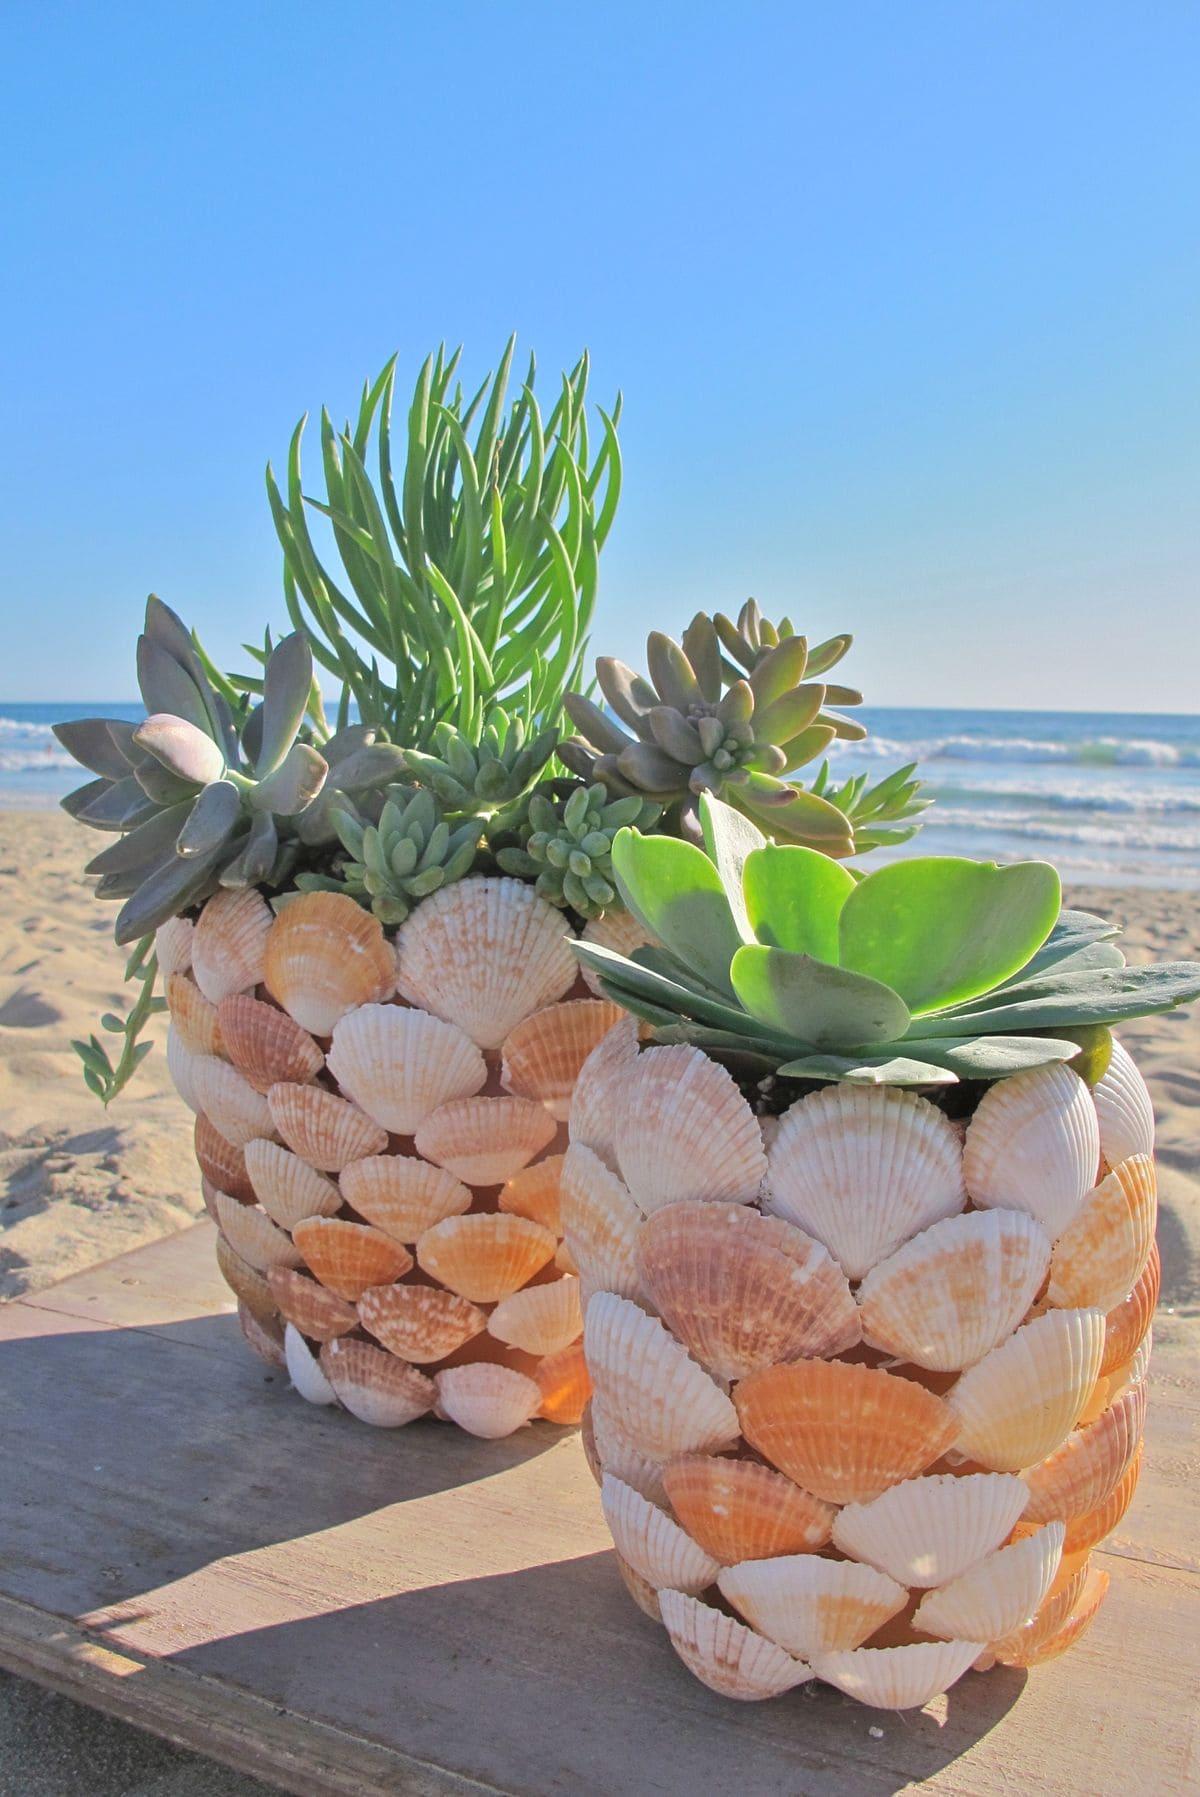 4.Succulent Project in Shell via Simphome.com